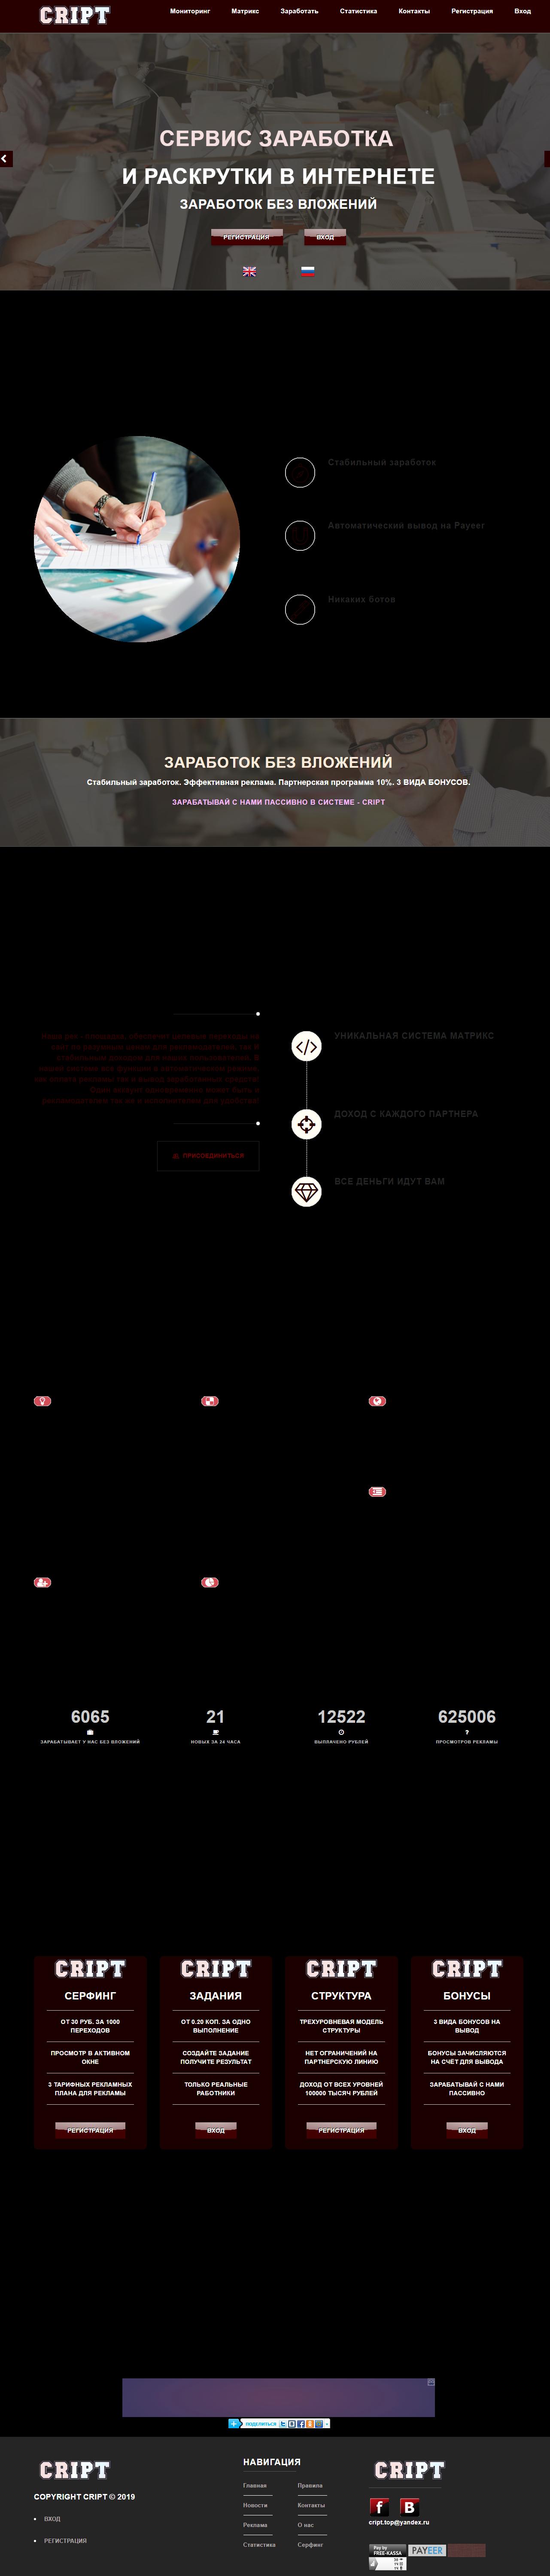 Скрипт Букс+ мониторинг CRIPT